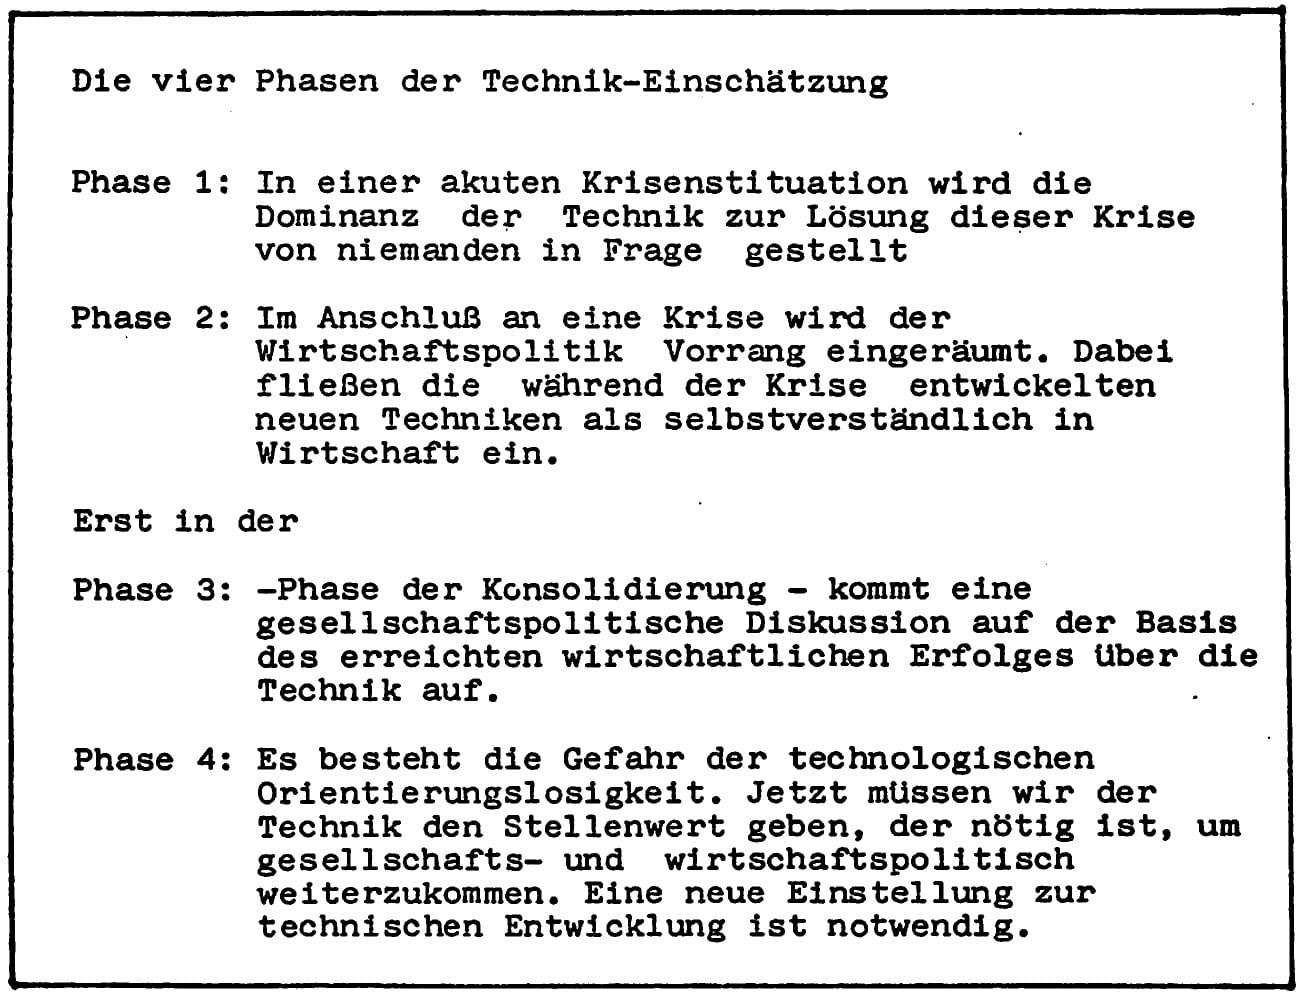 1987_02_05_DIHT-Artikeldienst_kpf-Schlüsseltechnologie-Mikroelektronik_01